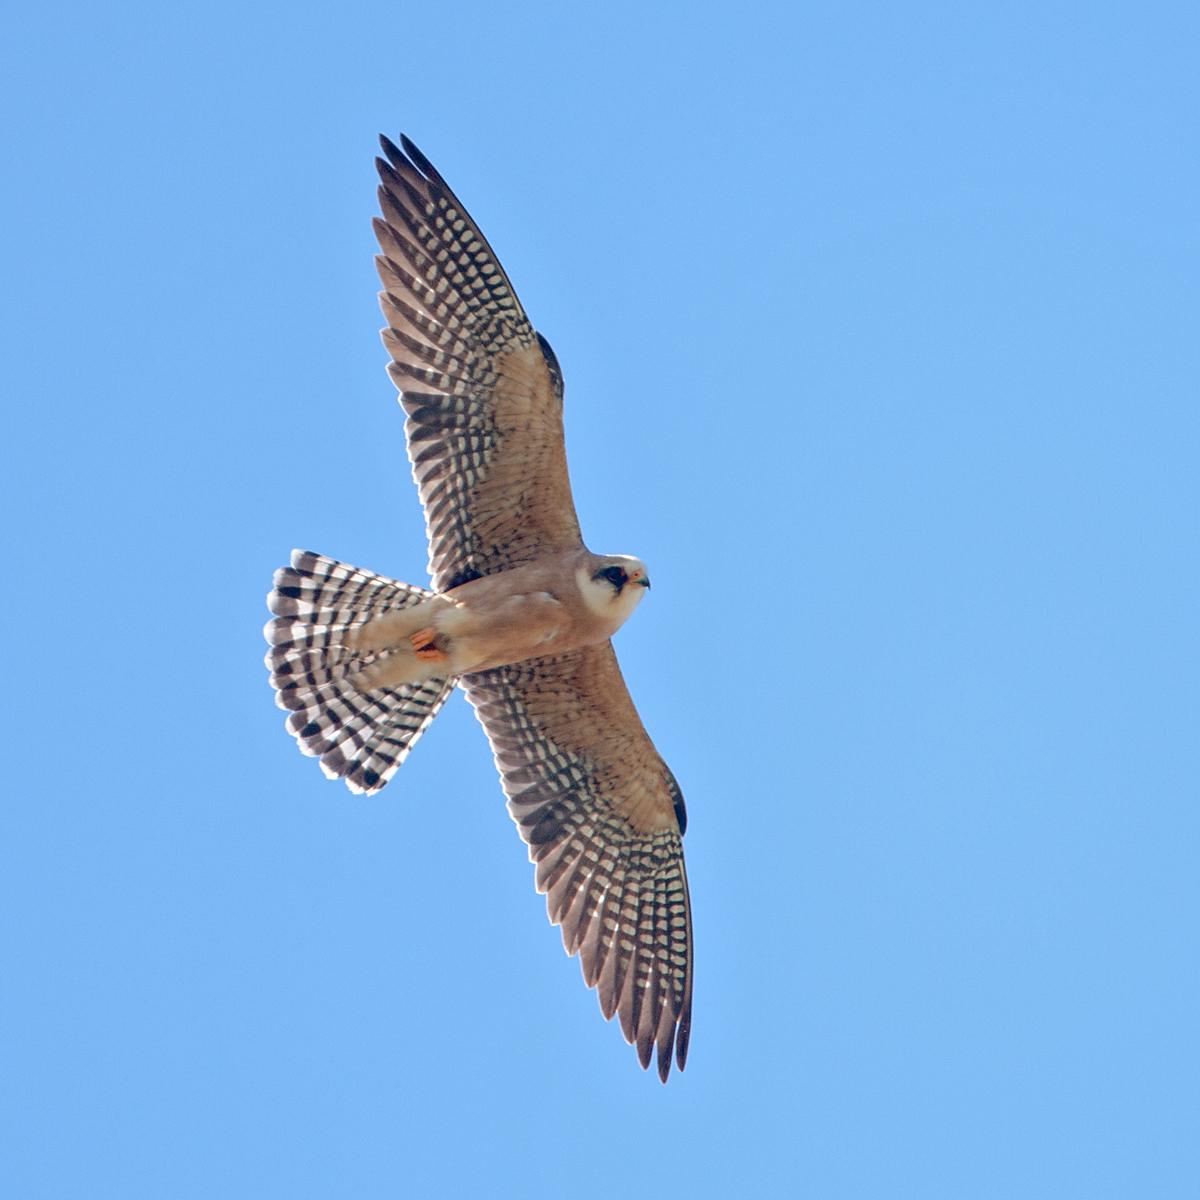 Falco vespertinus; Kasachstan; Red-footed Falcon; Rotfußfalke; birds; falconiformes; falken; female; flight; flug; greifvögel; pröhl; raptors; vögel; weibchen